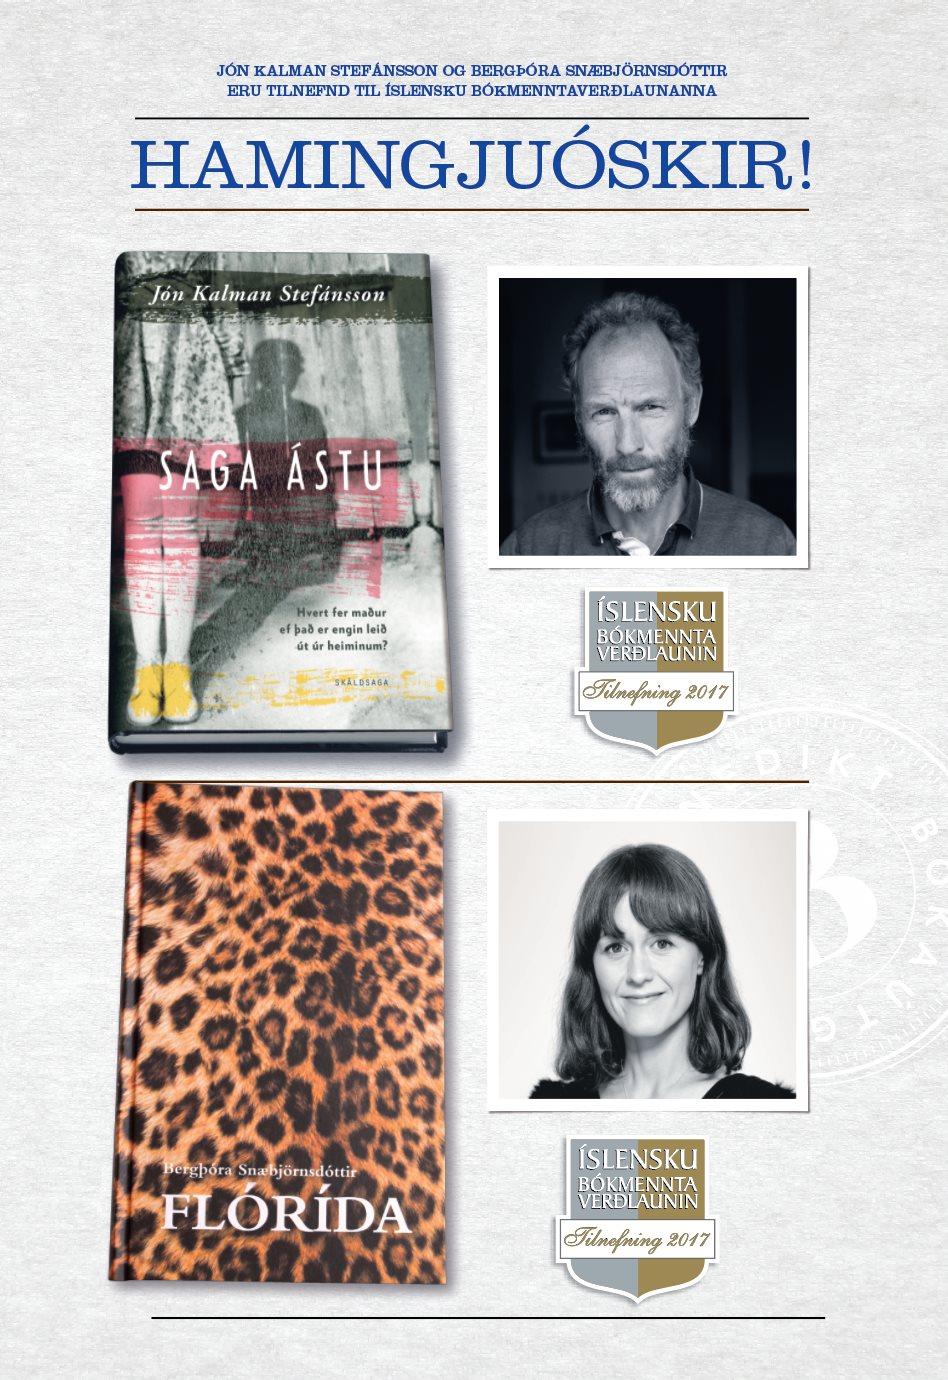 Icelandic Literary Award